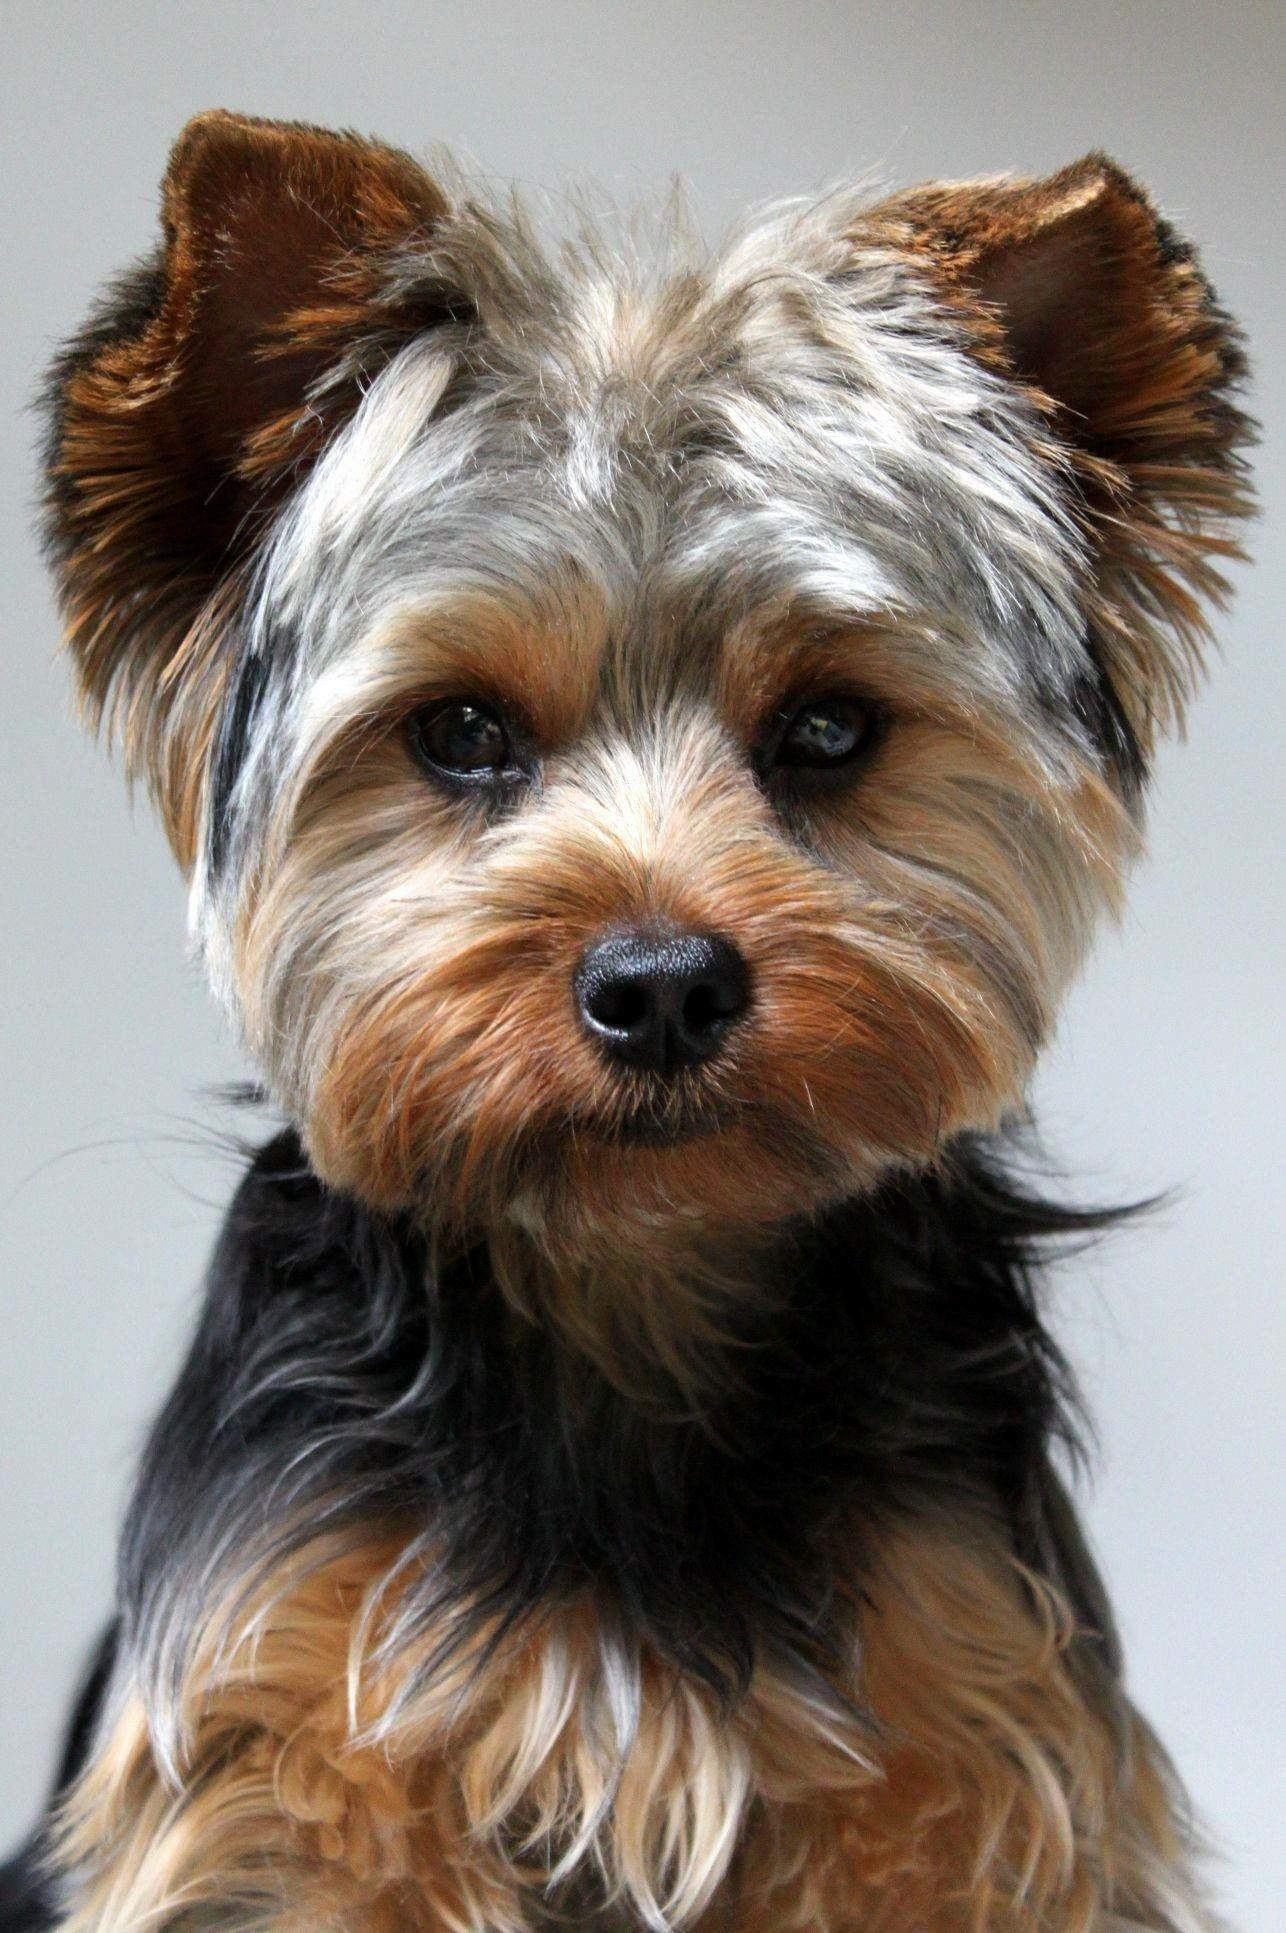 Der Hässlichste Hund - Der Hässlichste Hund